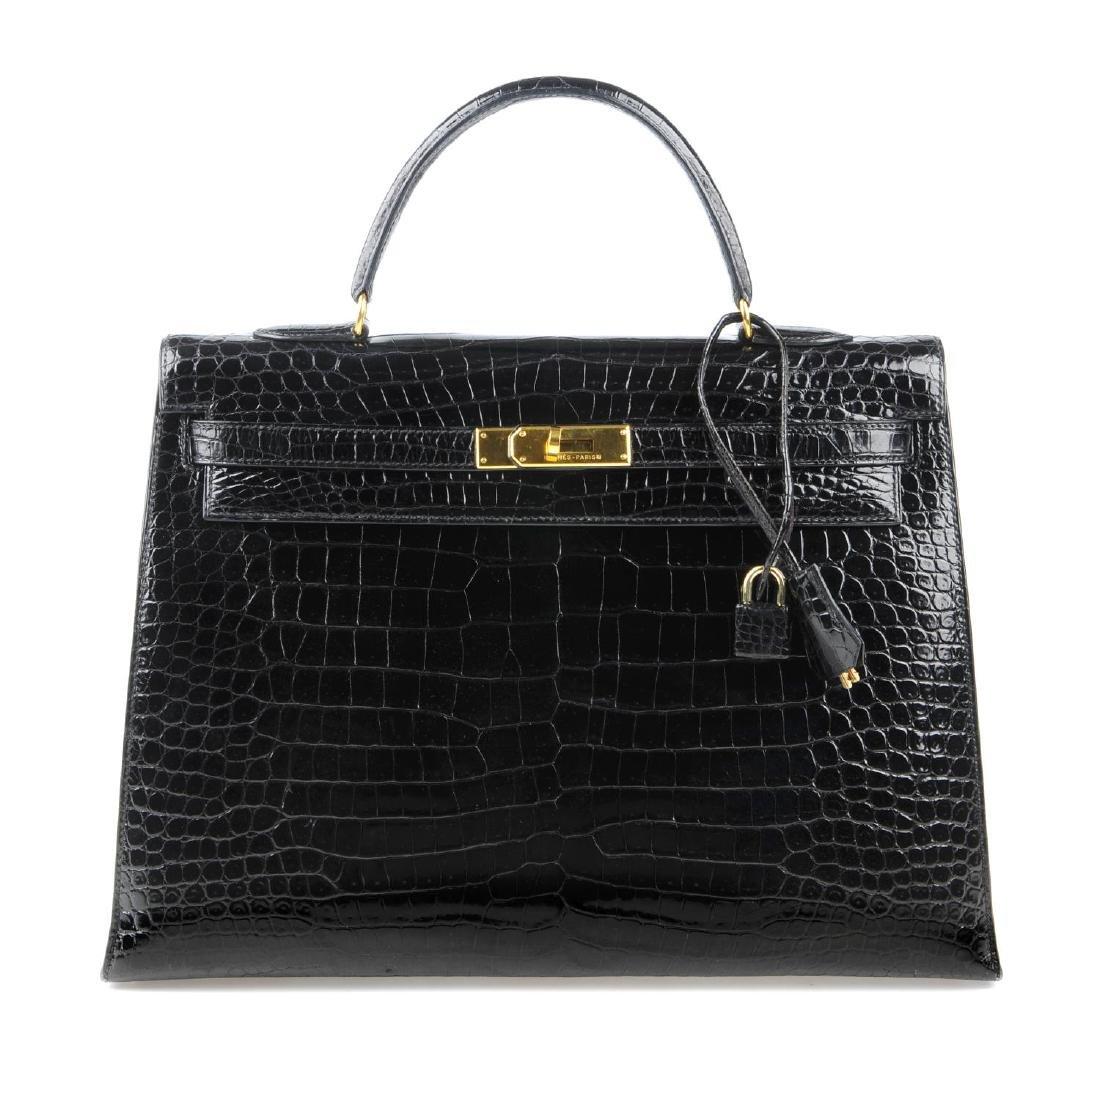 HERMÈS - a black Porosus Crocodile Kelly 35 handbag.